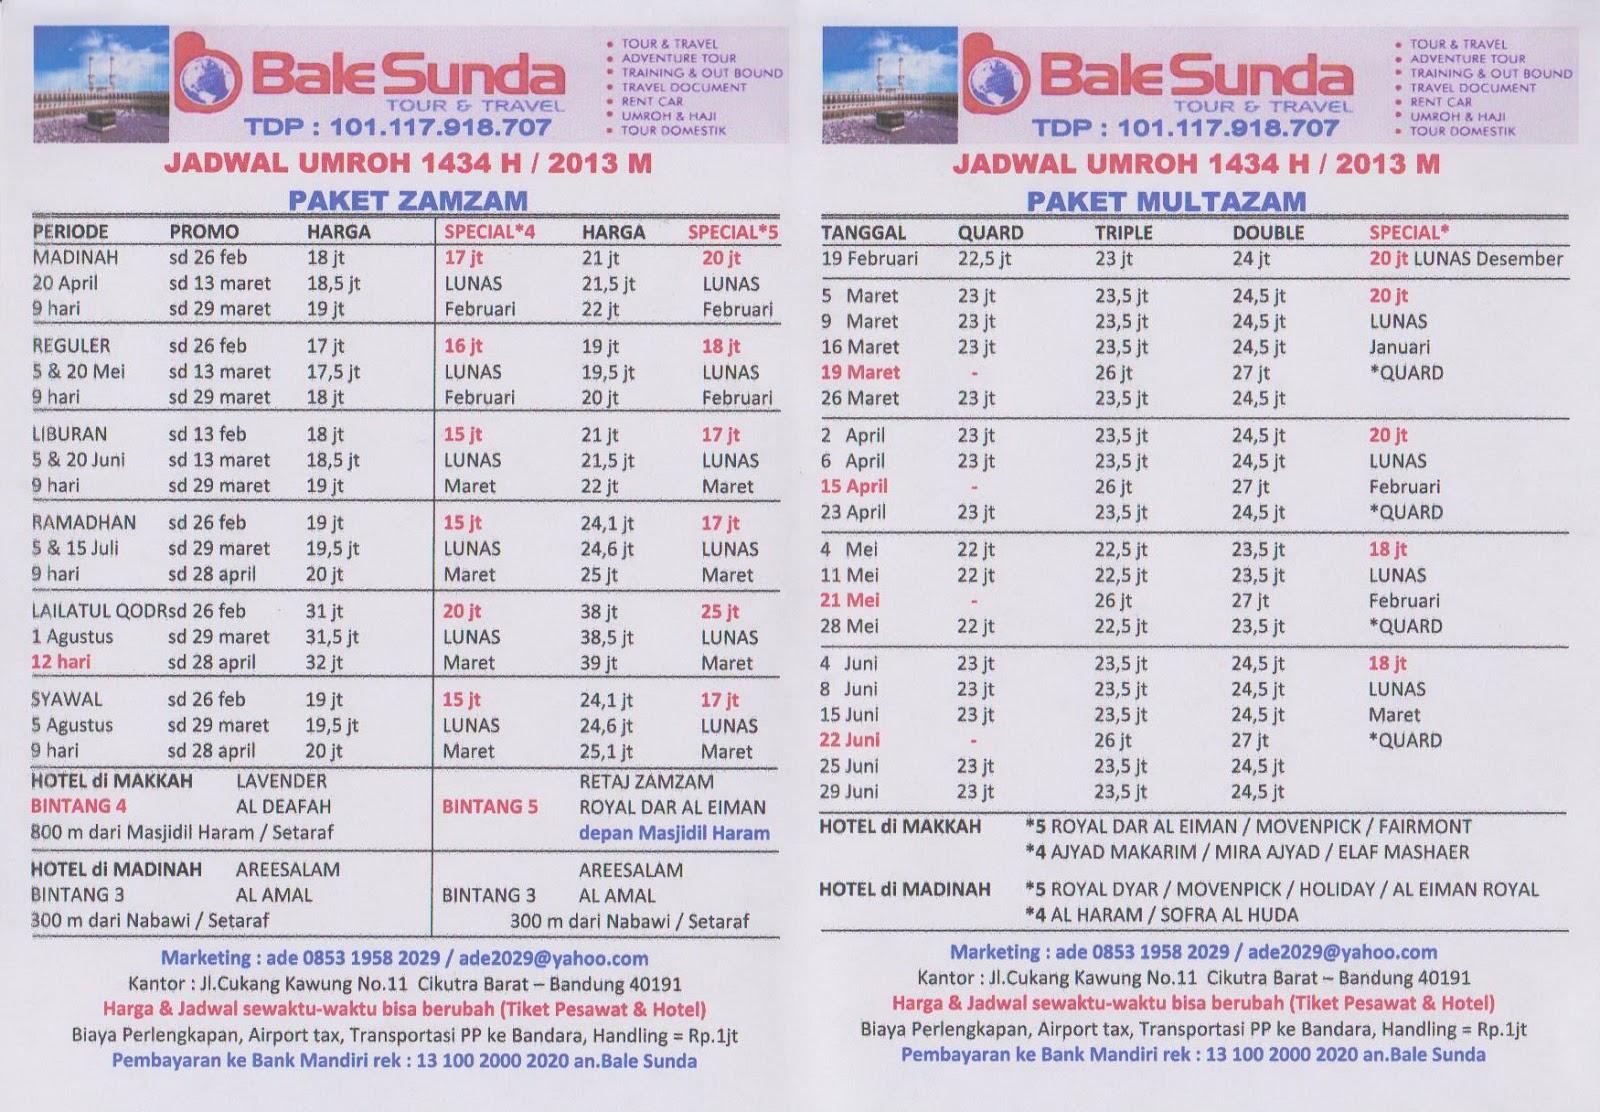 Bale Sunda Tours & Travel + Kedai Kopi & Resto